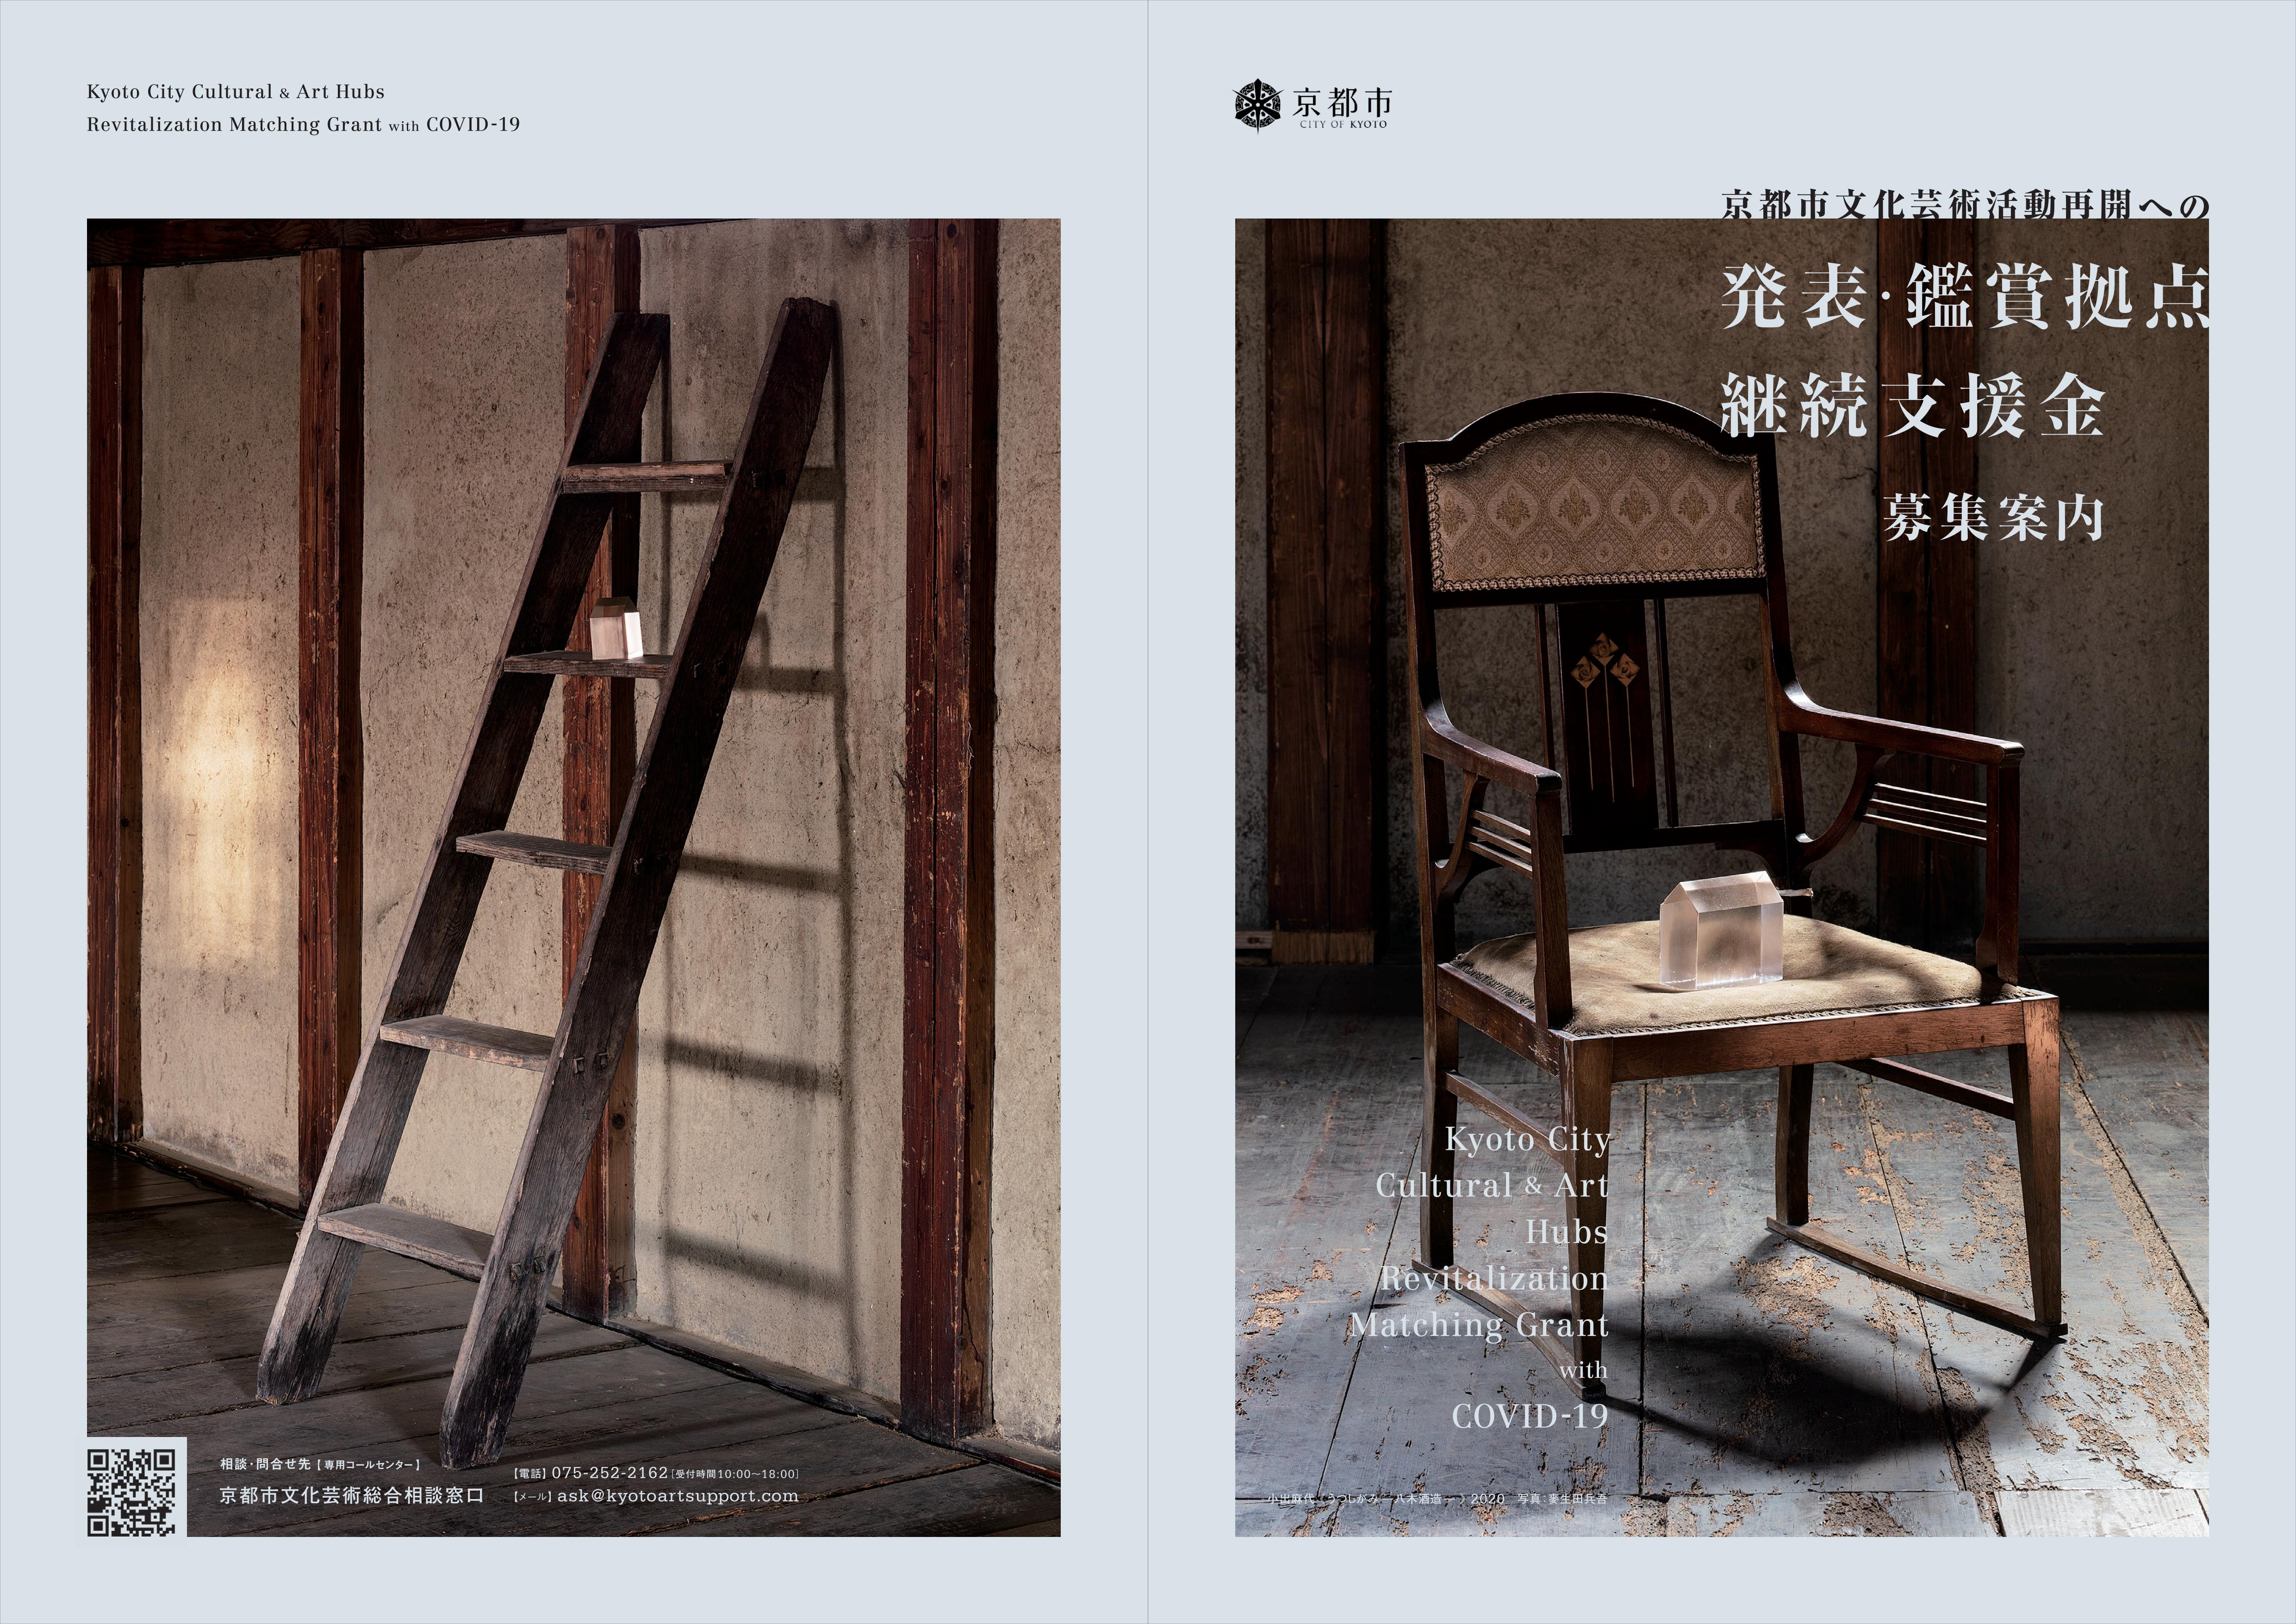 「京都市文化芸術活動再開への発表・鑑賞拠点継続支援金」リーフレット